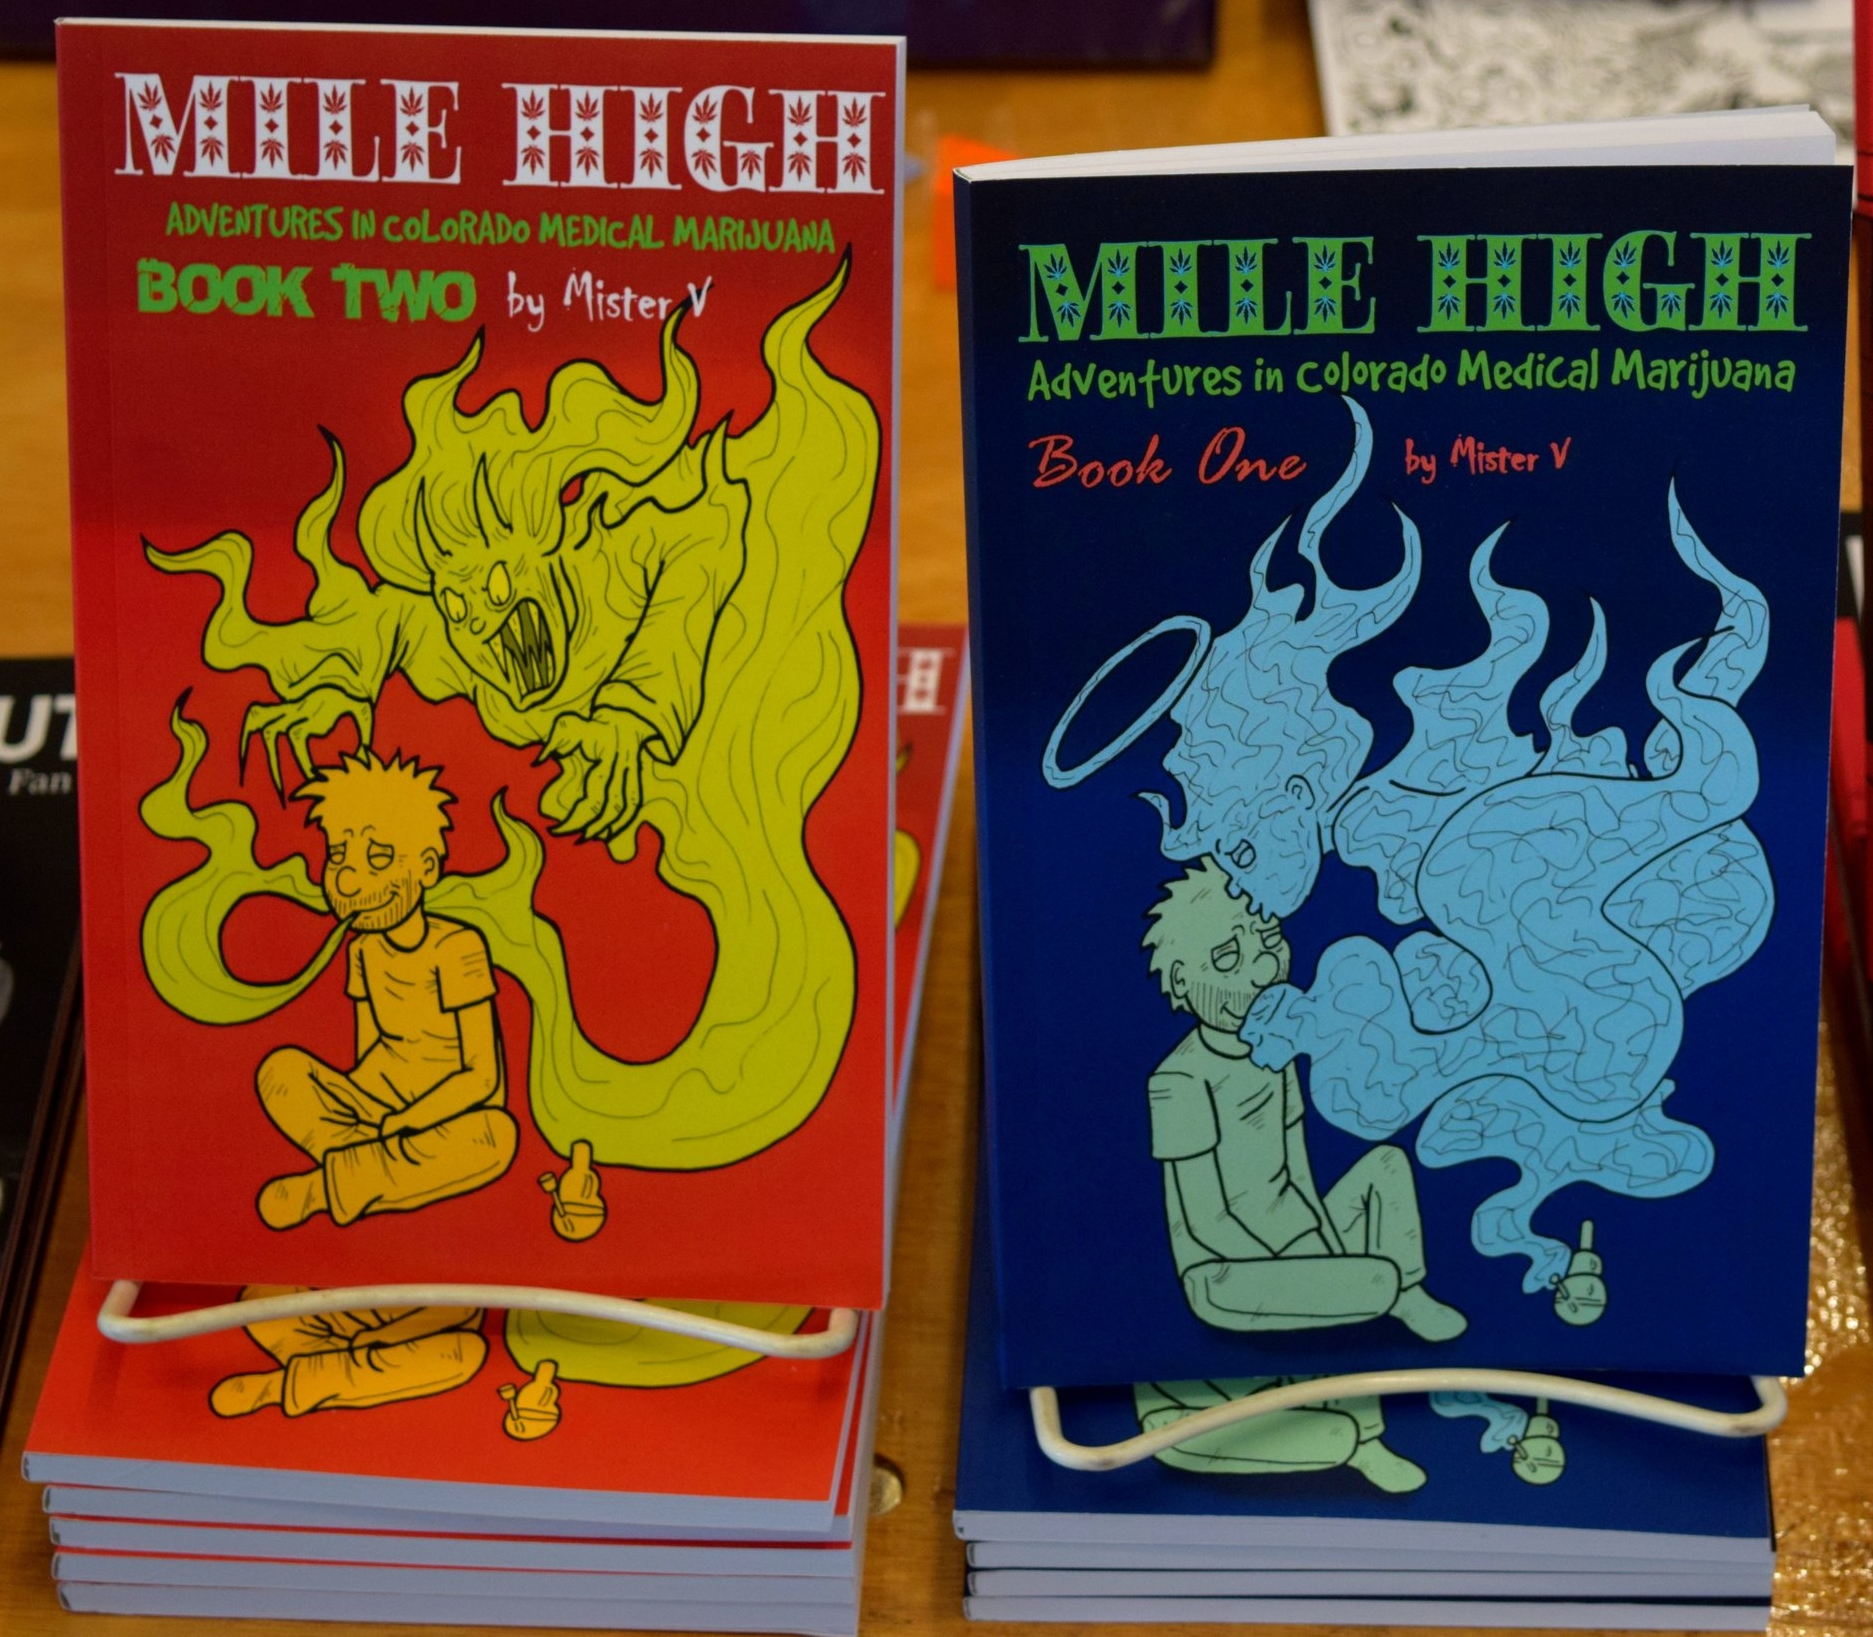 Mile High: Adventures in Colorado Medical Marijuana books #1 & #2 from Mister V.